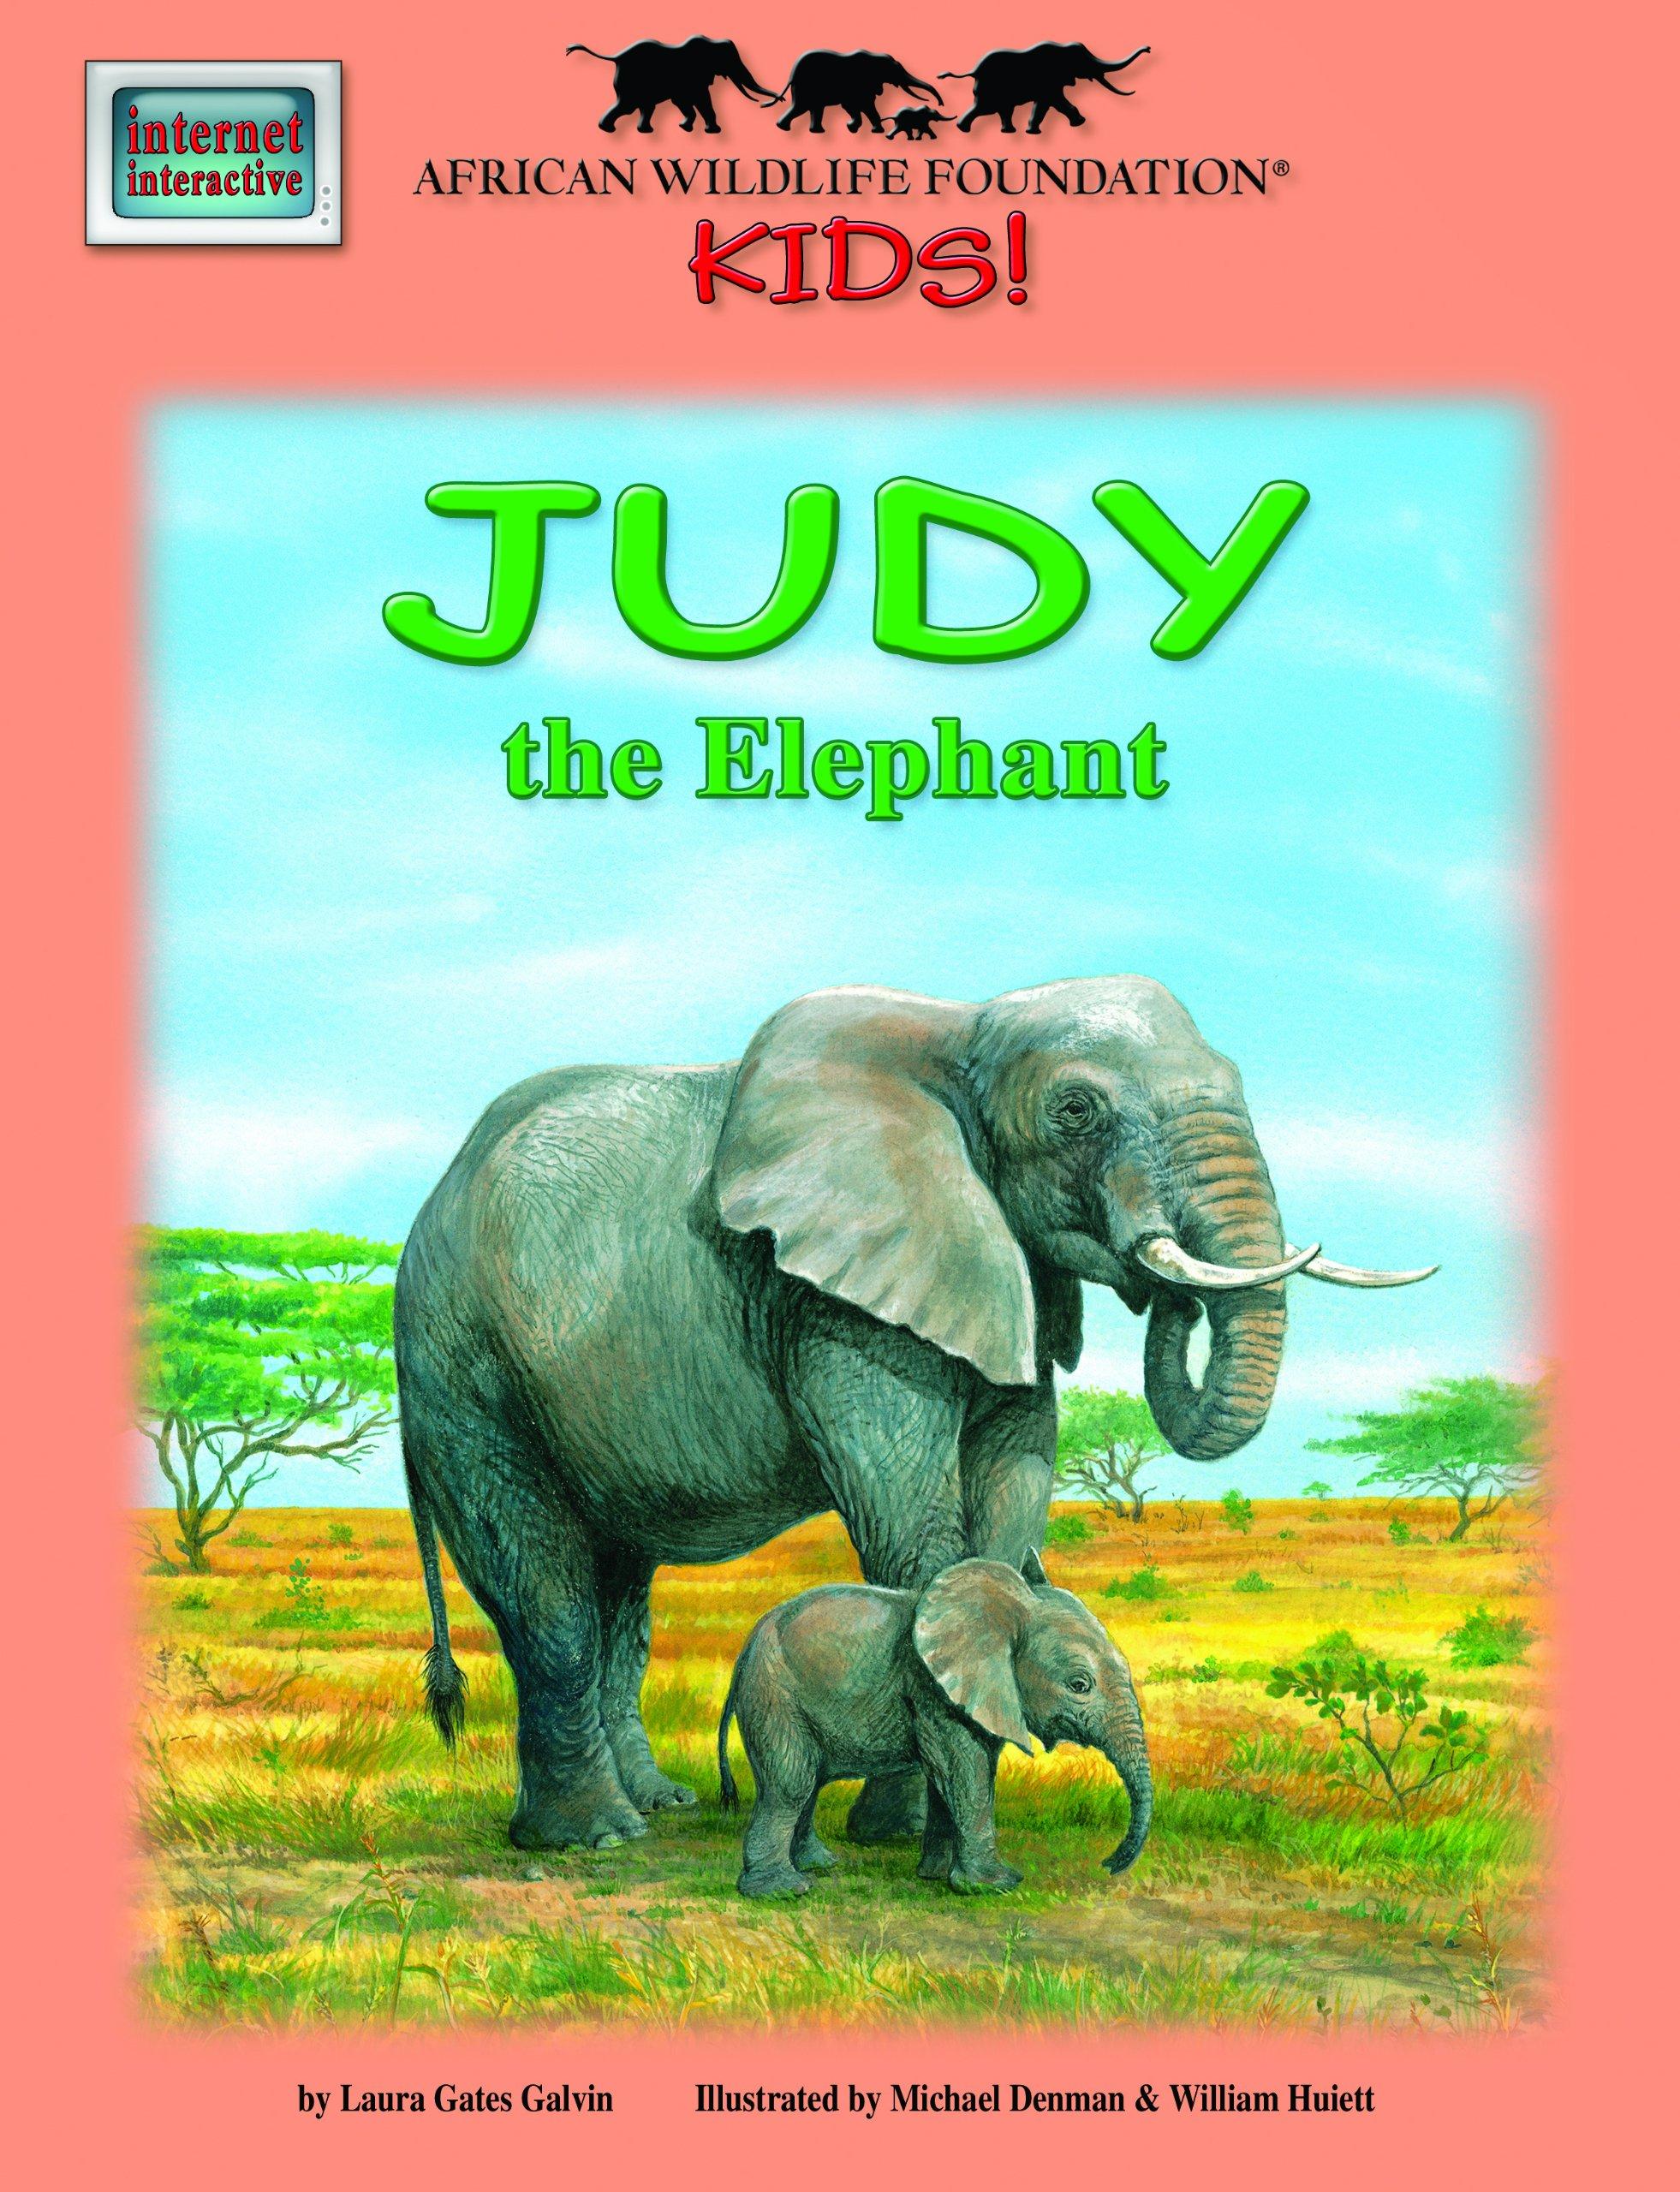 Judy the Elephant - An African Wildlife Foundation Story (with audio CD) (African Wildlife Foundation Kids!)